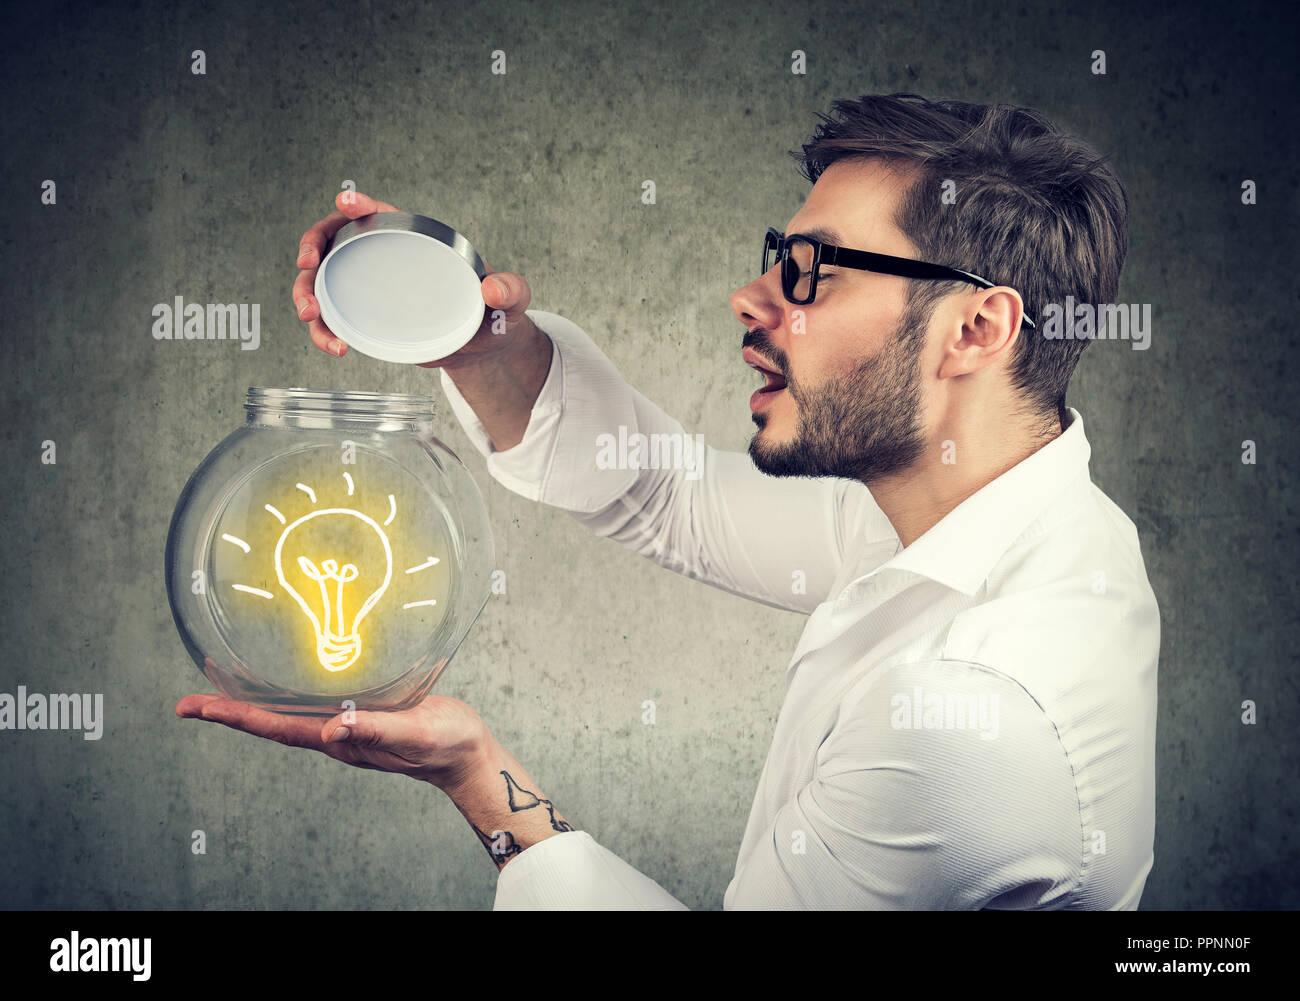 Mann hält ein Glas Glas mit helle Idee lighbulb innen Kreativ aufgeregt Stockbild